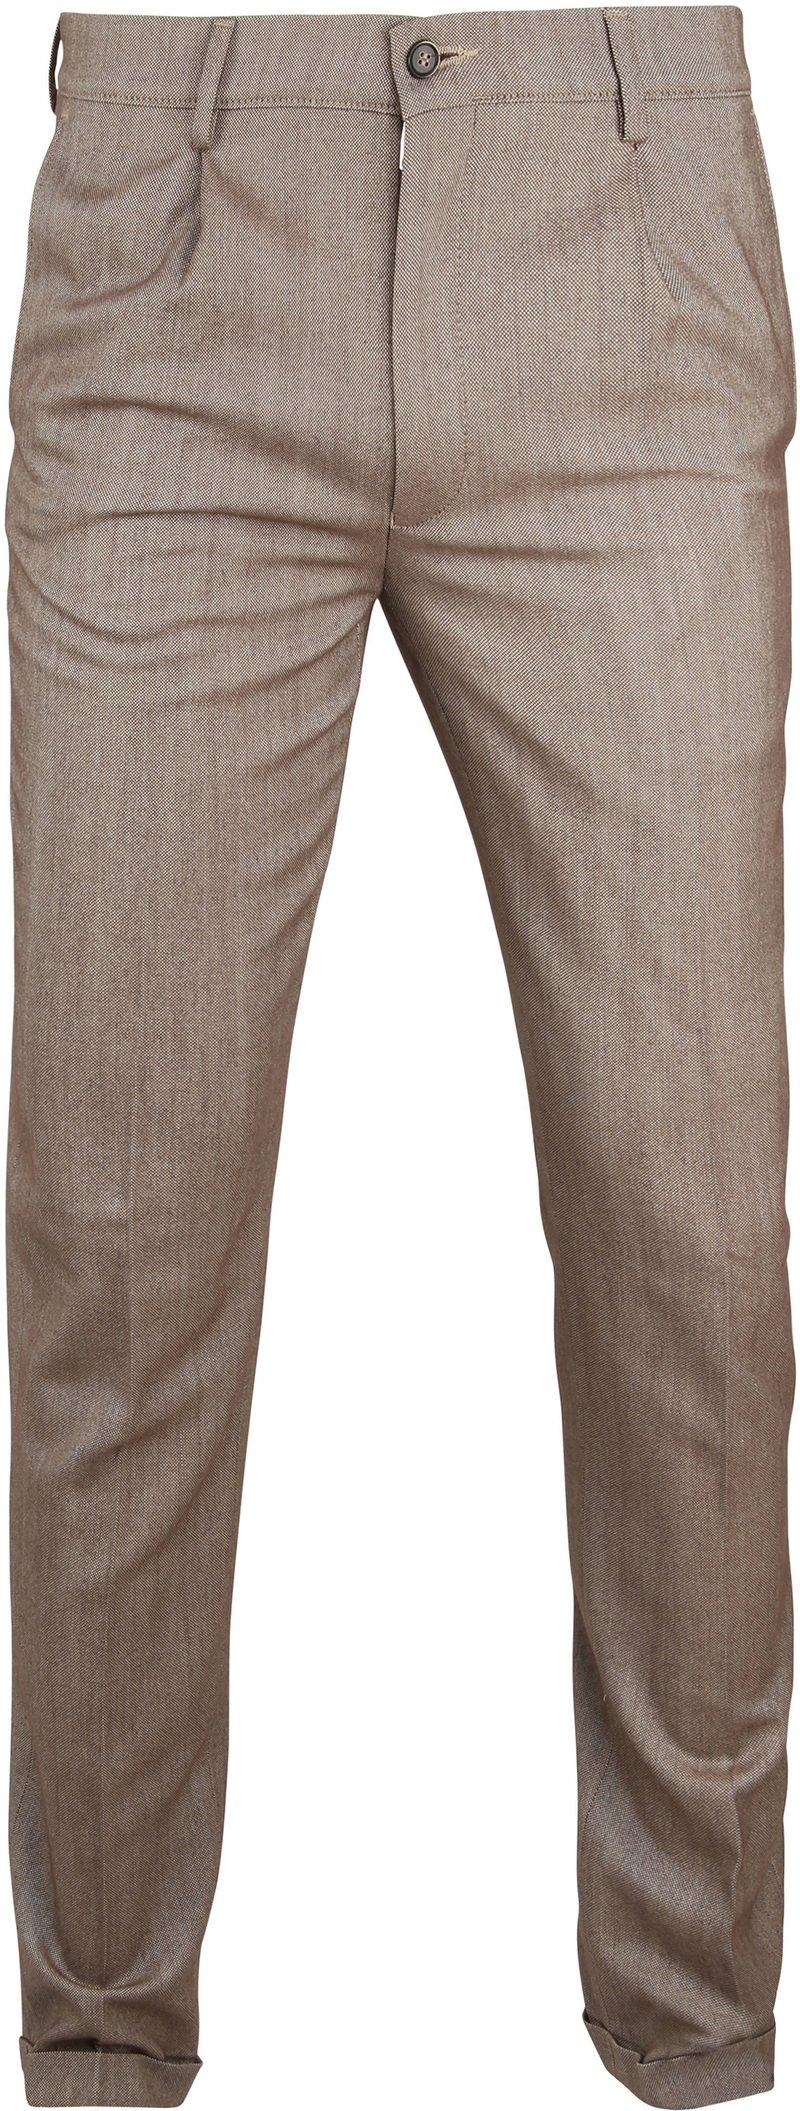 Suitable Premium Pantalon Rimini Bruin foto 0